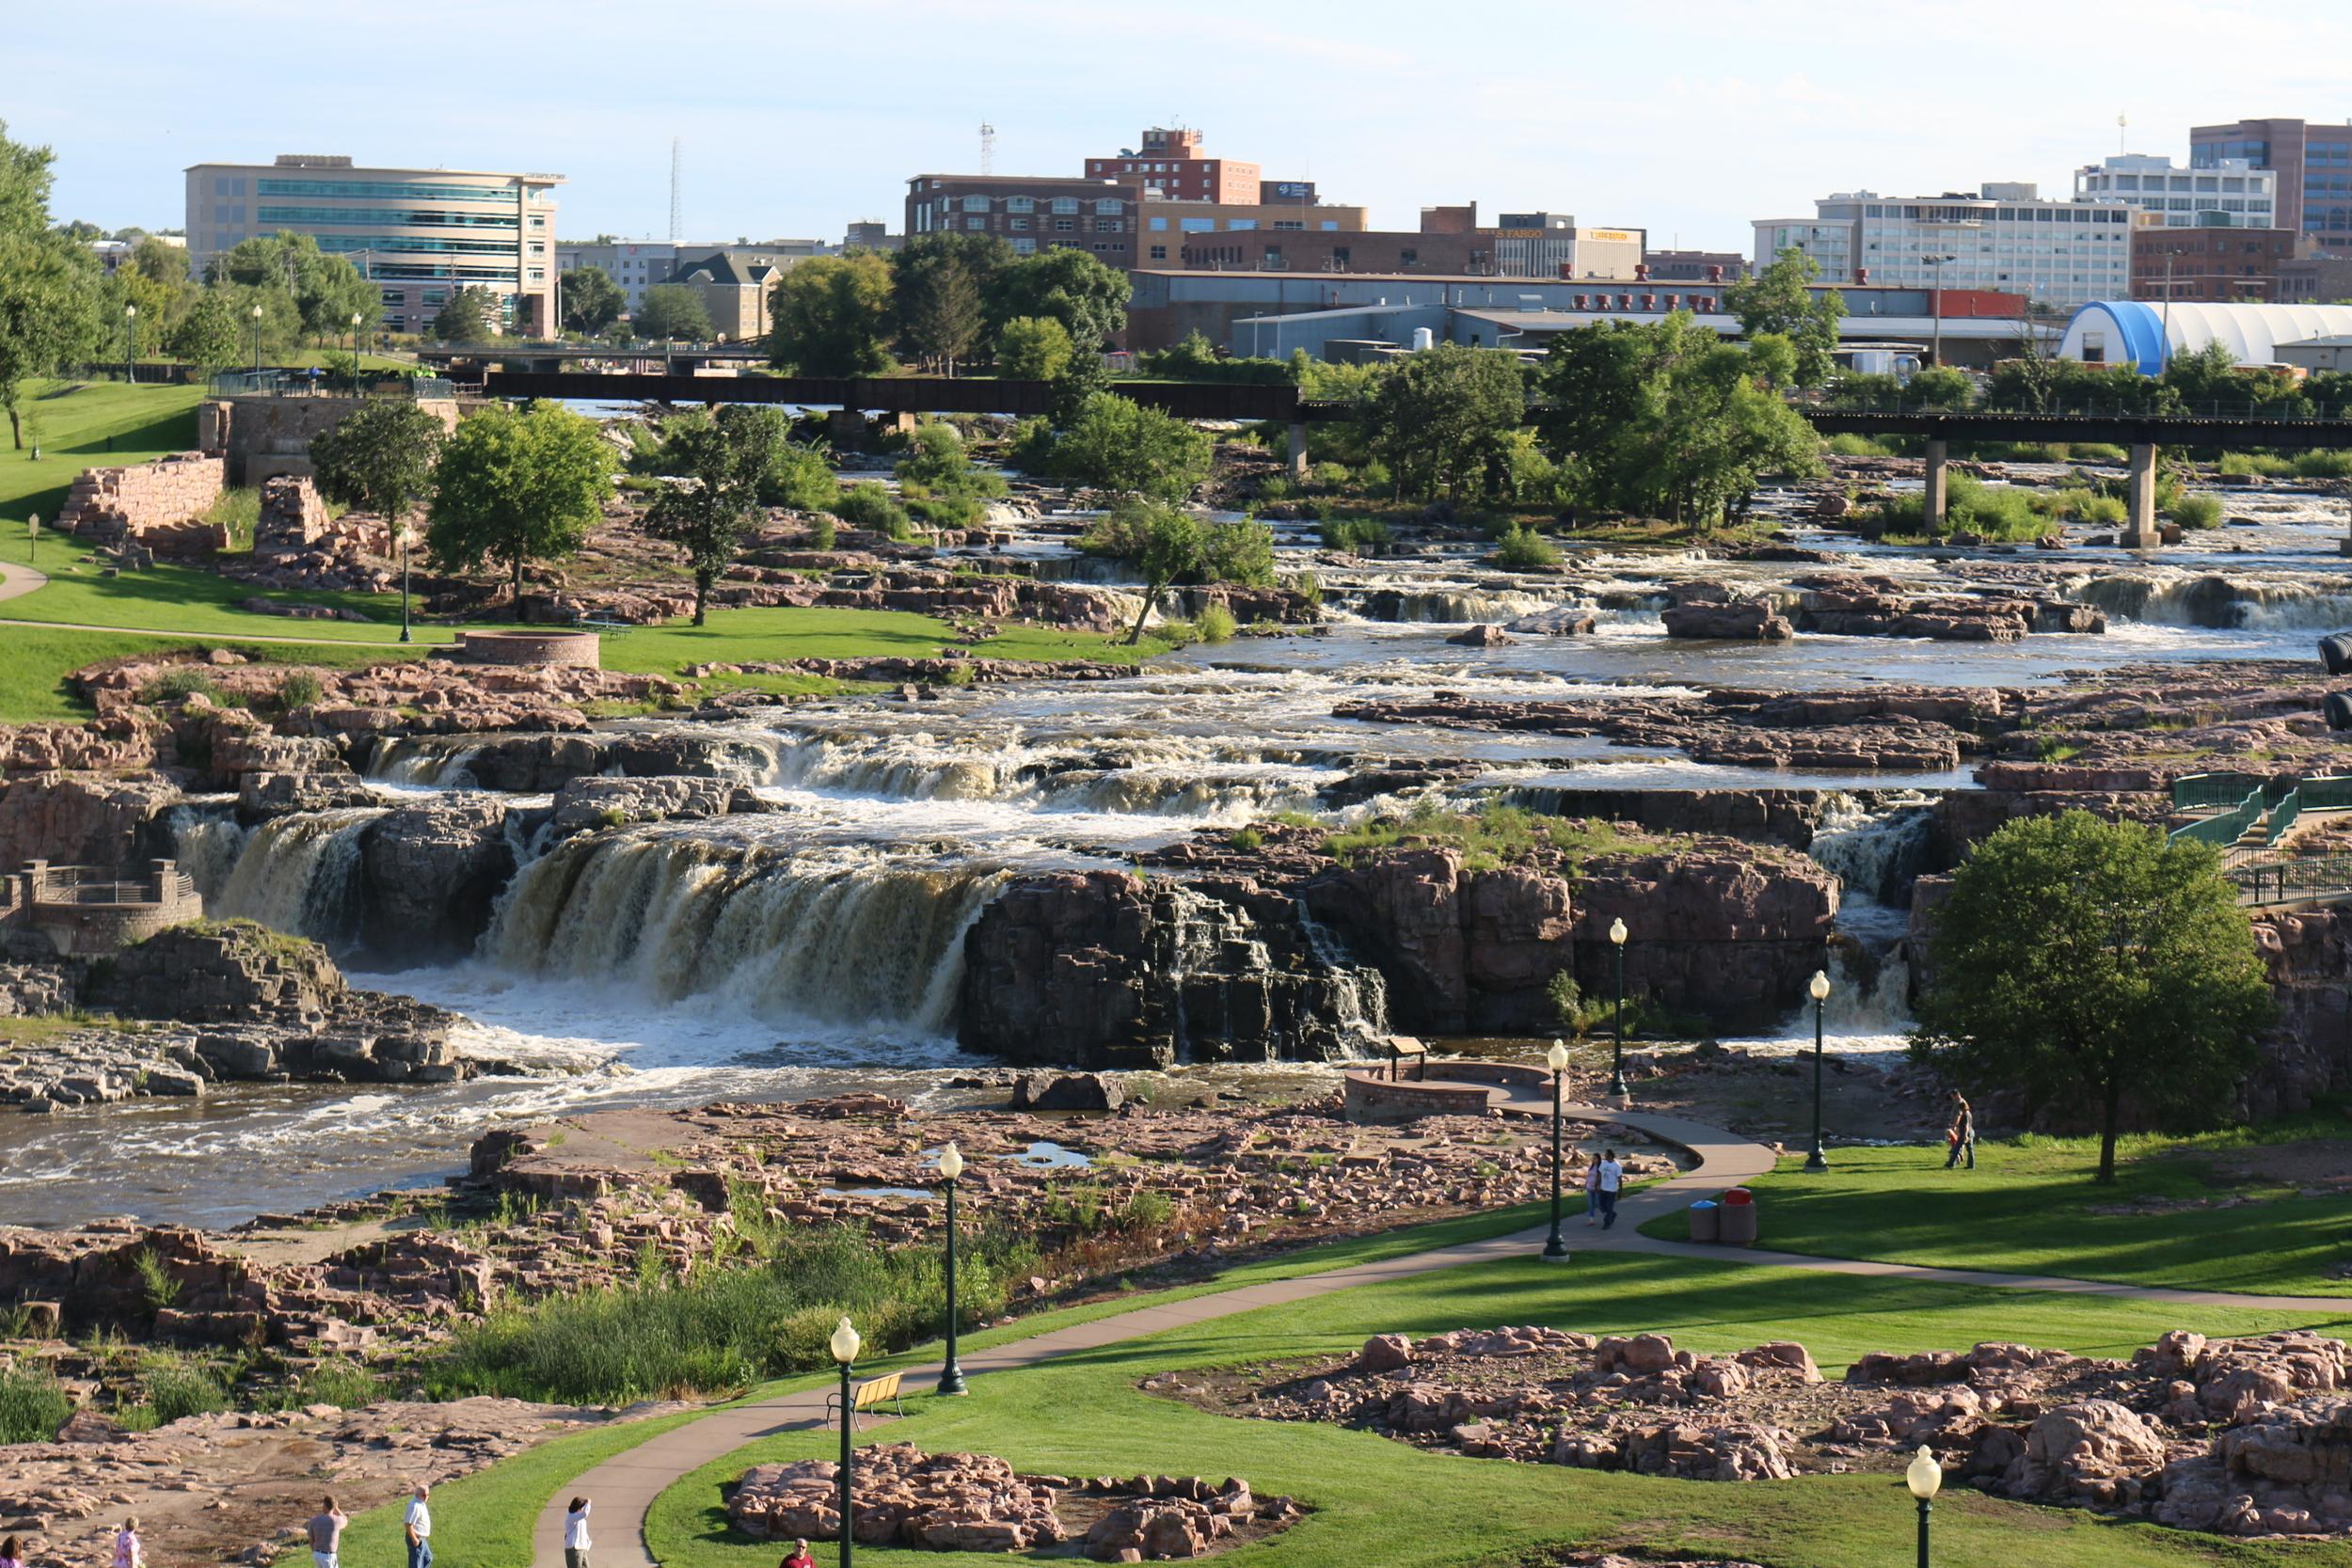 Falls Park, Sioux Falls, SD.